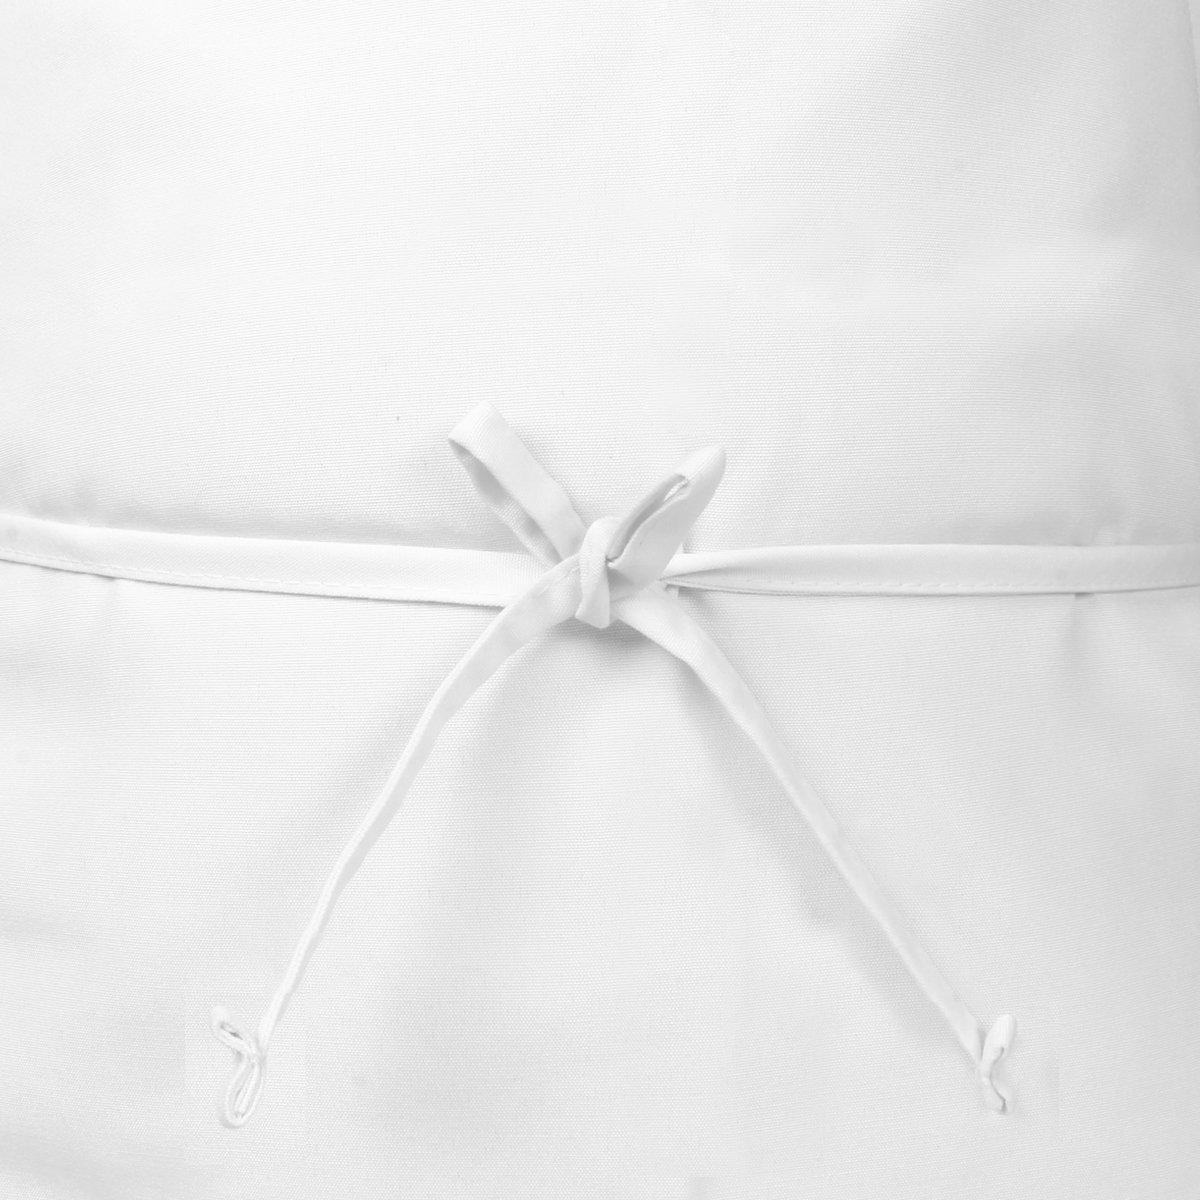 White apron hobby lobby - White Apron Hobby Lobby 33